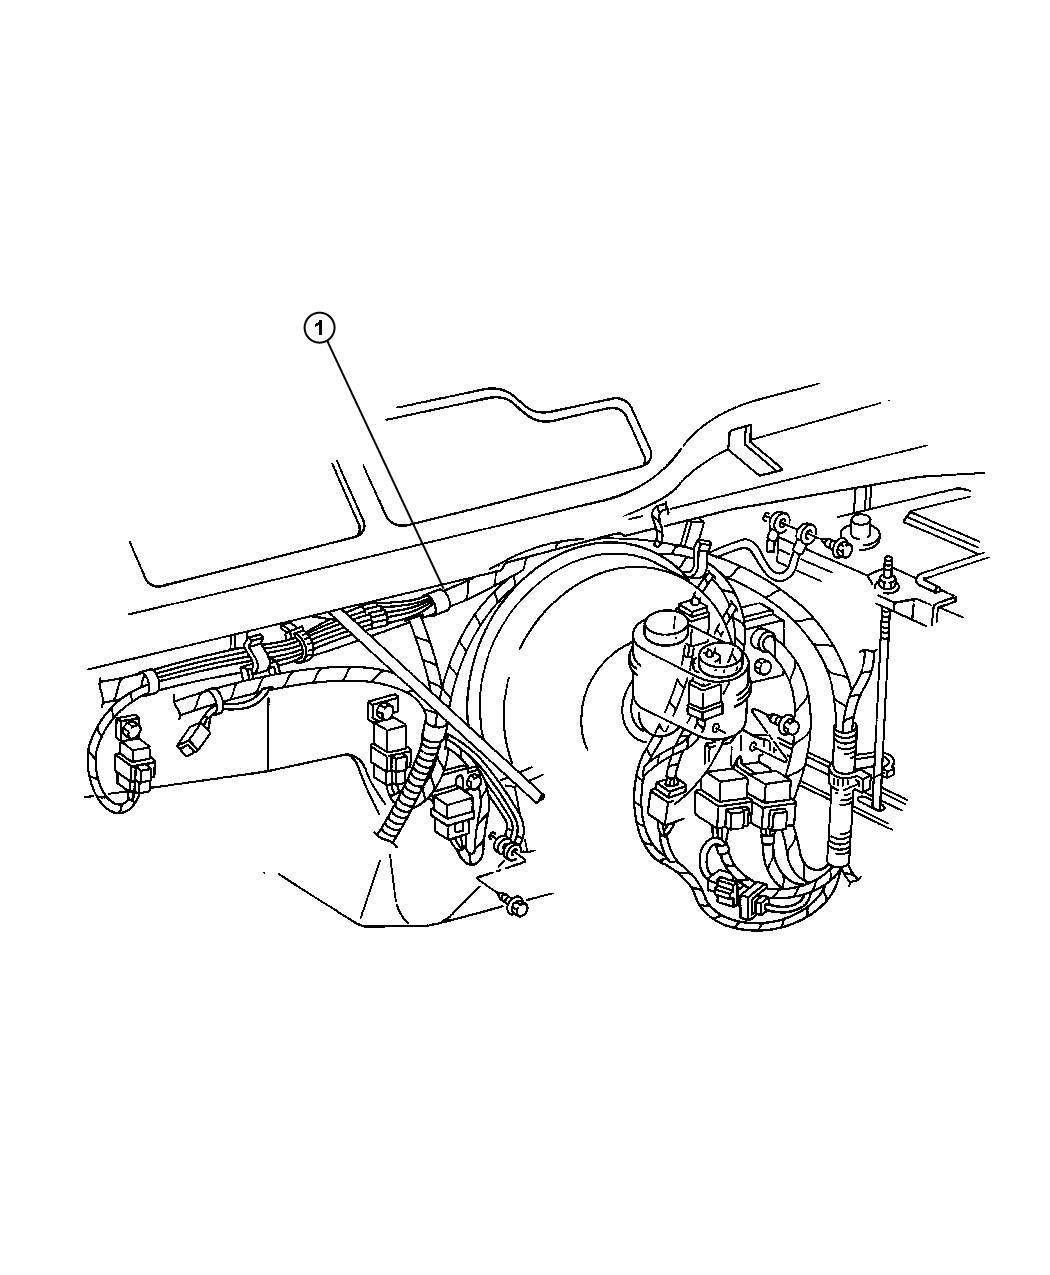 jeep grand cherokee breaker  circuit  power seat  power window   20  amp  20 amp  20 amp